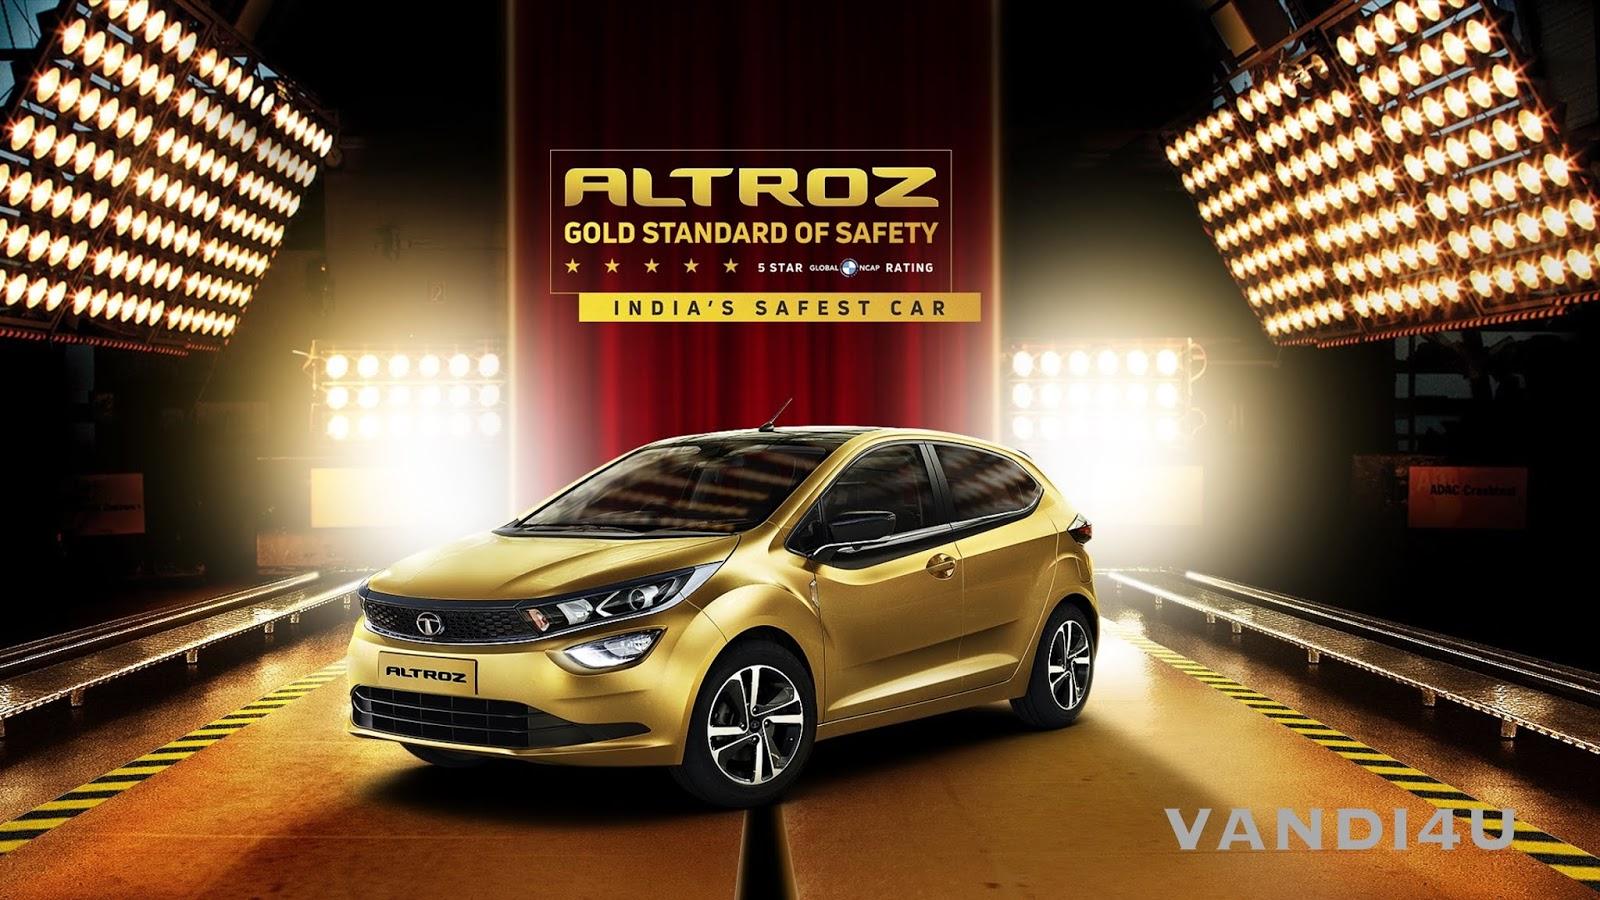 Tata Altroz scores 5-star safety rating from Global NCAP | VANDI4U